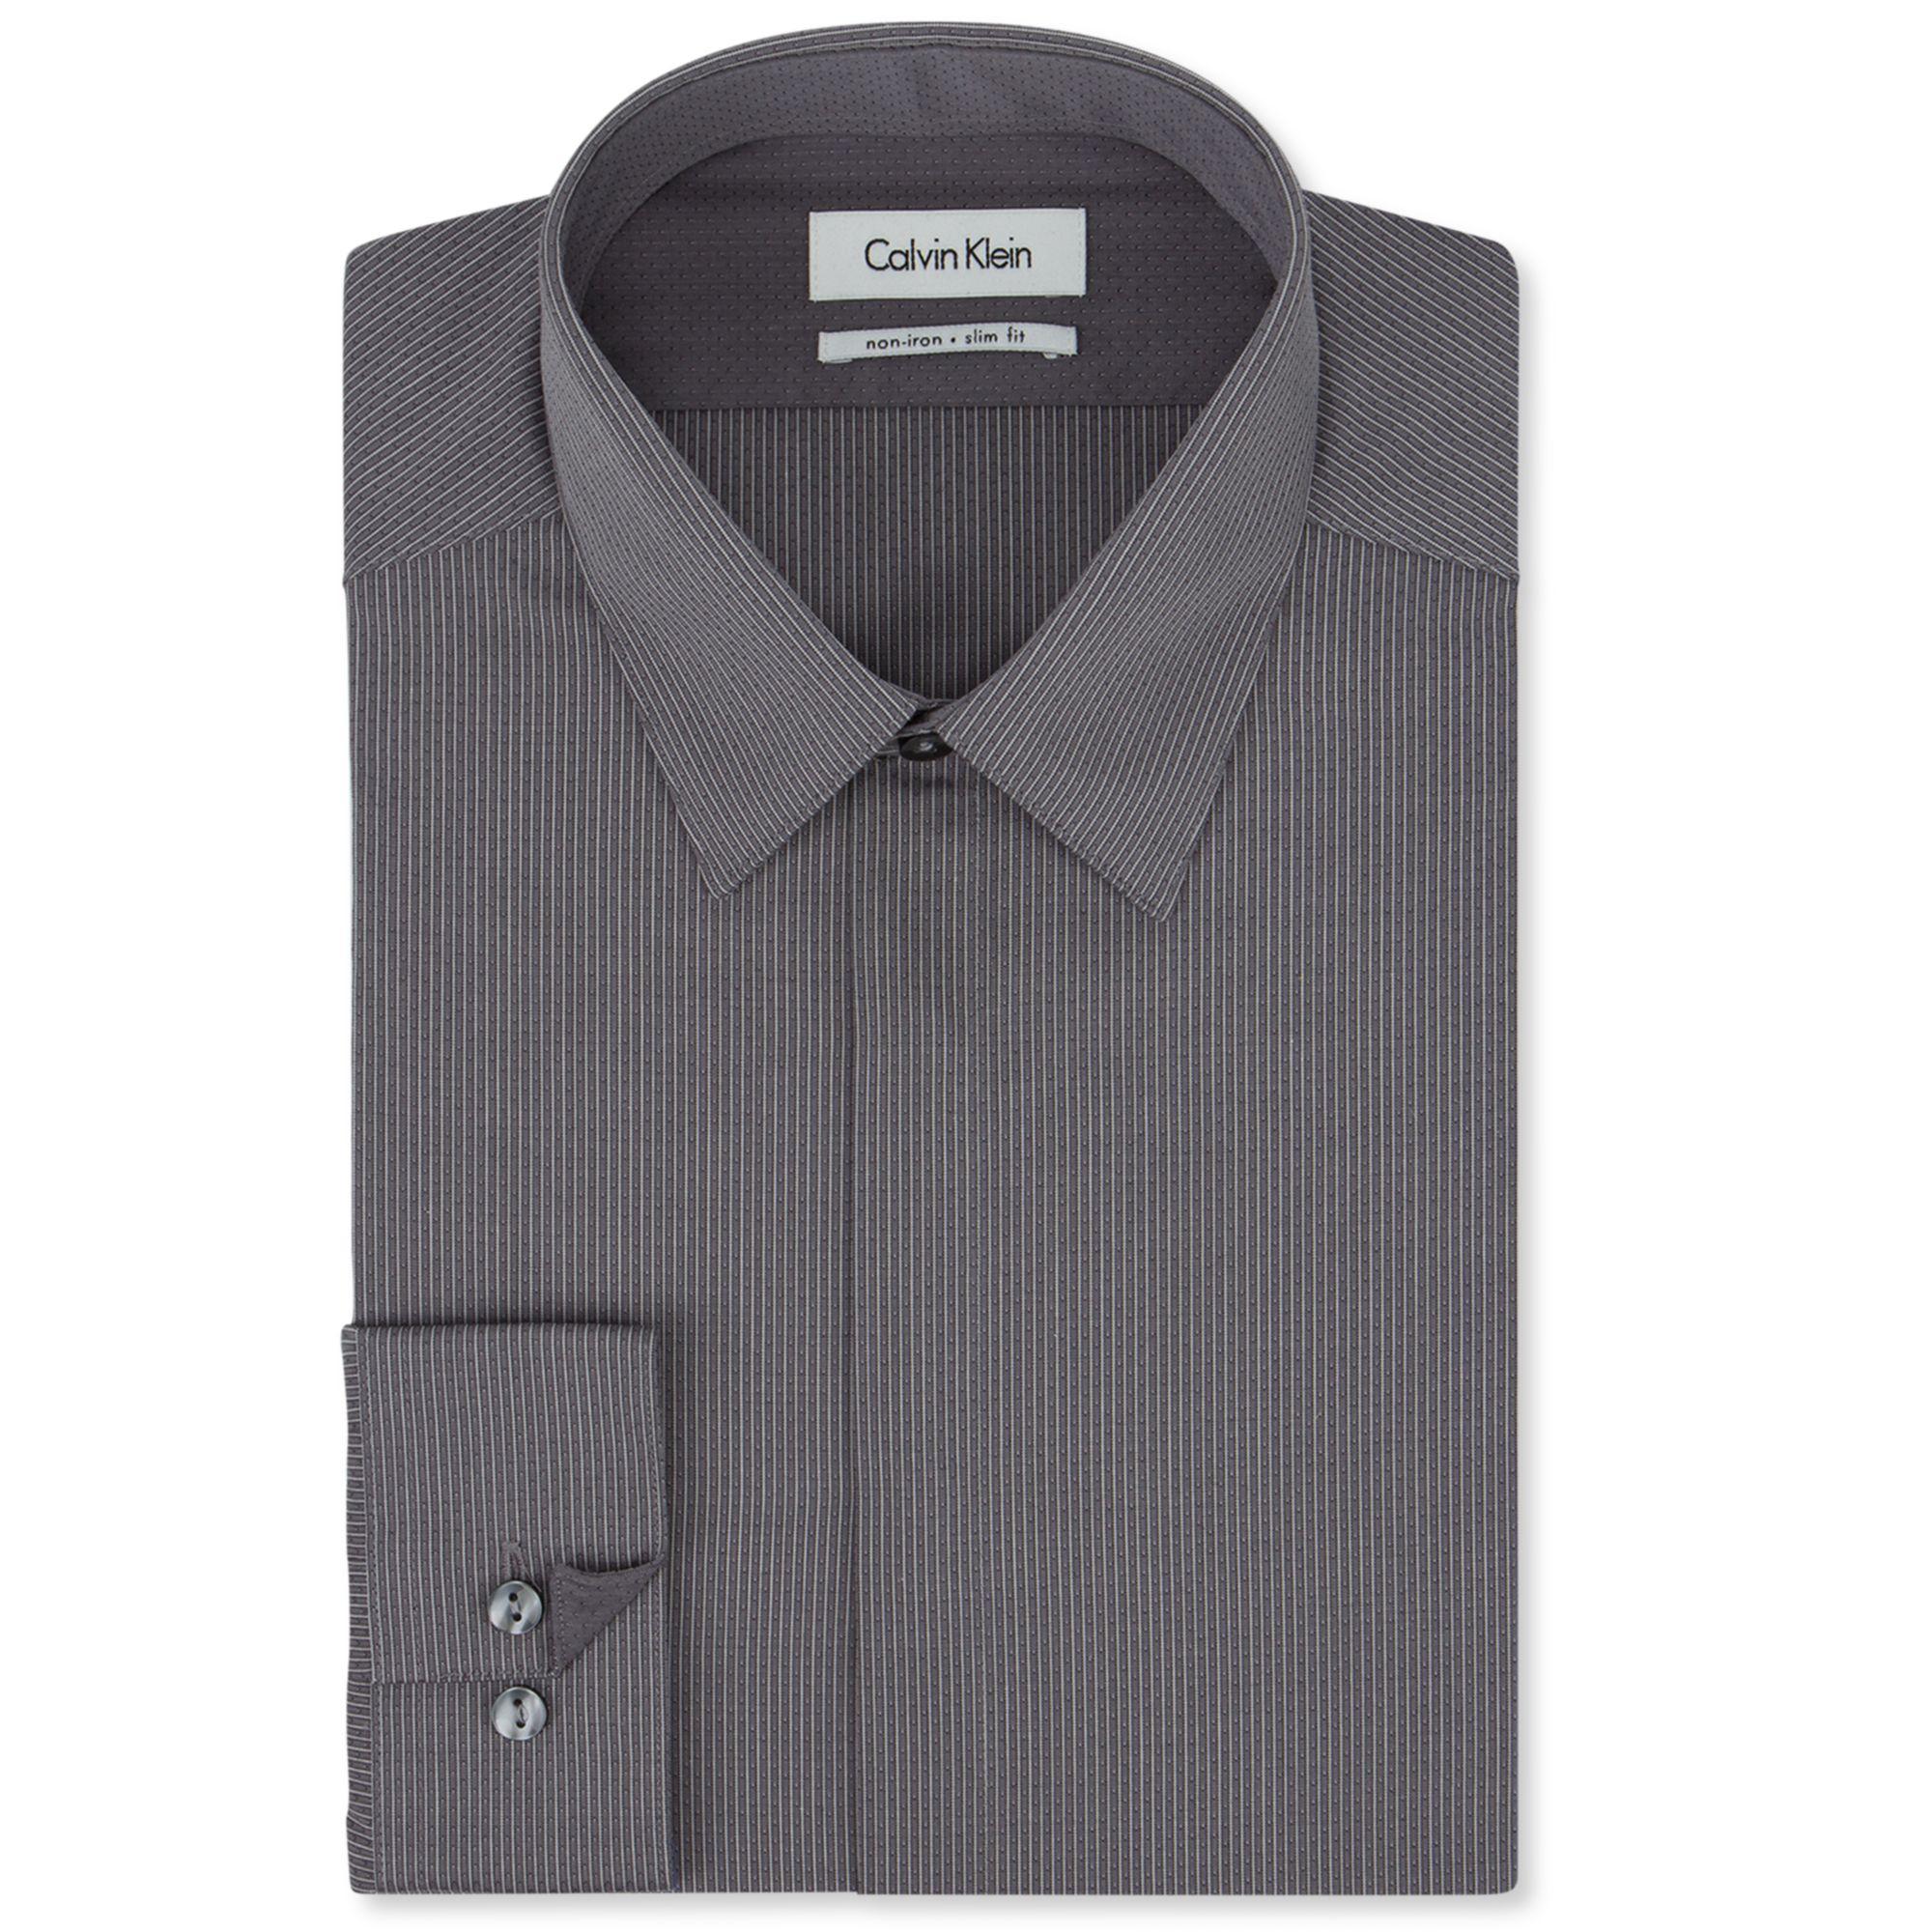 Calvin Klein Steel Grey Stripe Dress Shirt In Gray For Men